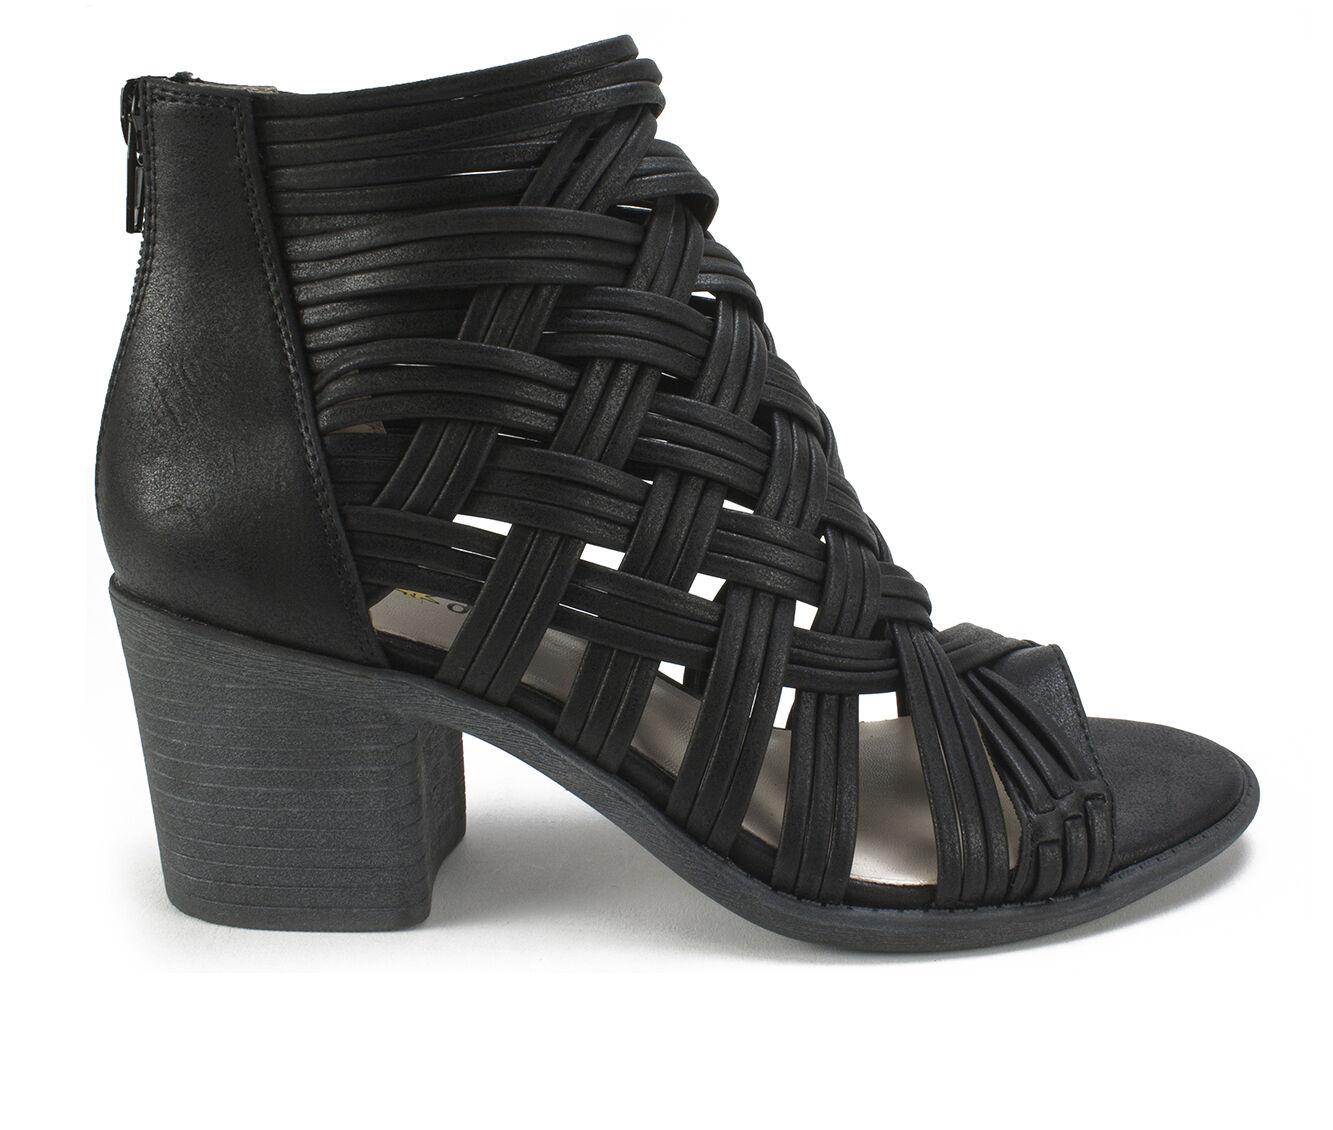 Women's Seven Dials Brixton Strappy Heeled Sandals Black